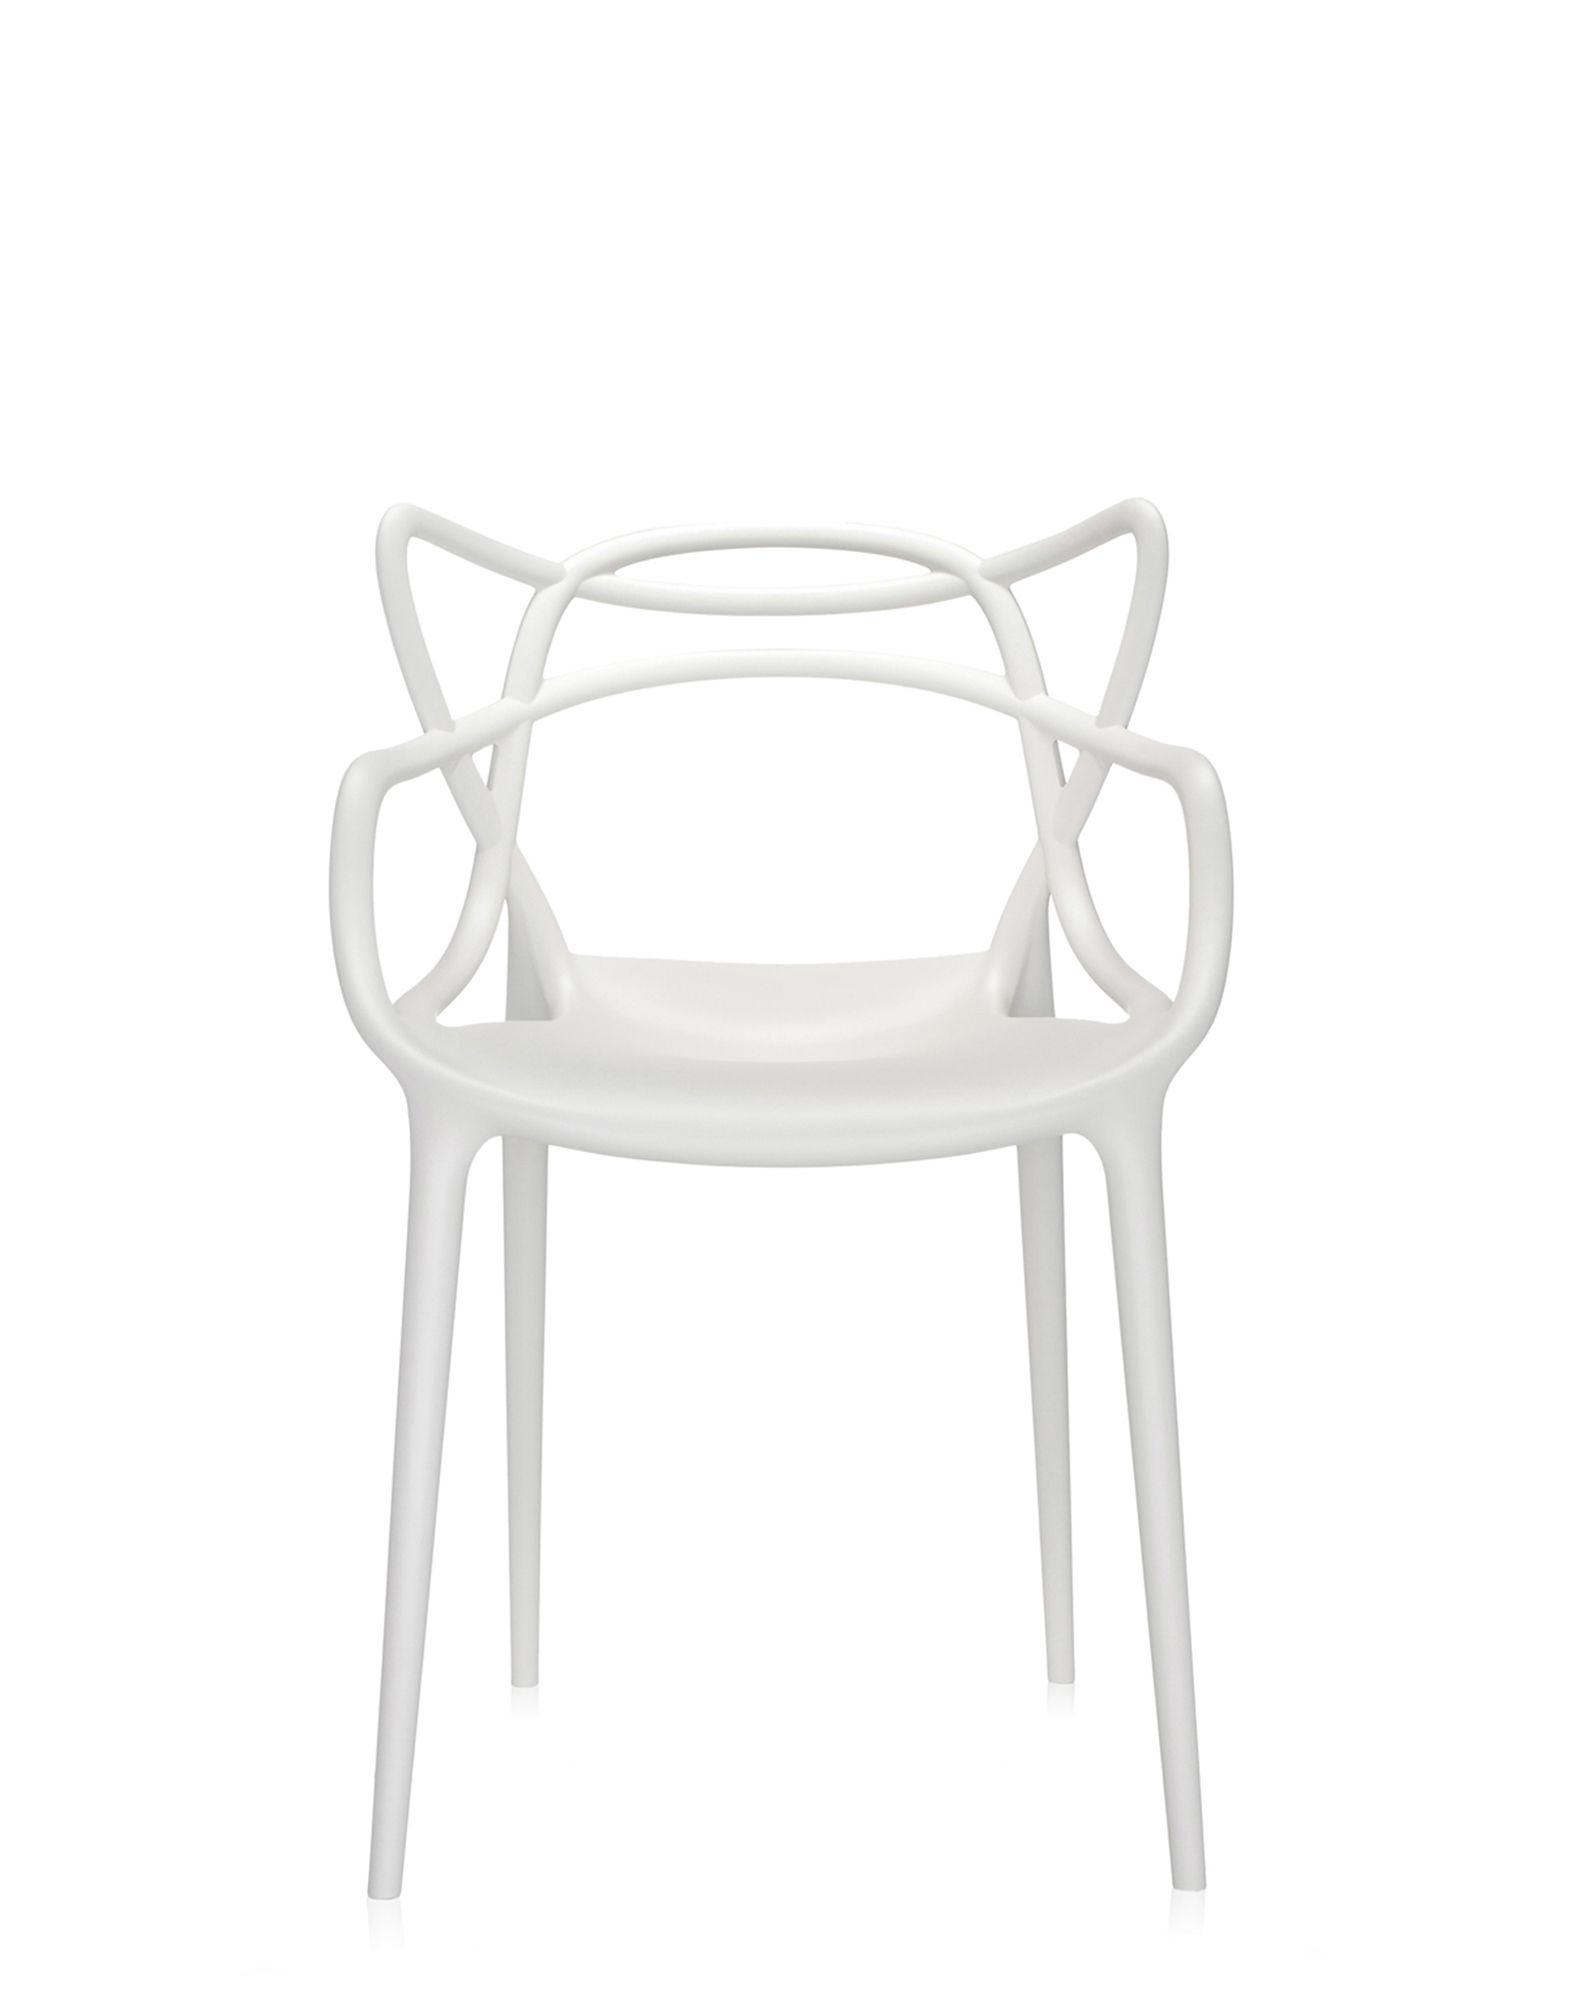 Kartell sedia masters bianca sedie design newformsdesign for Sedia design bianca